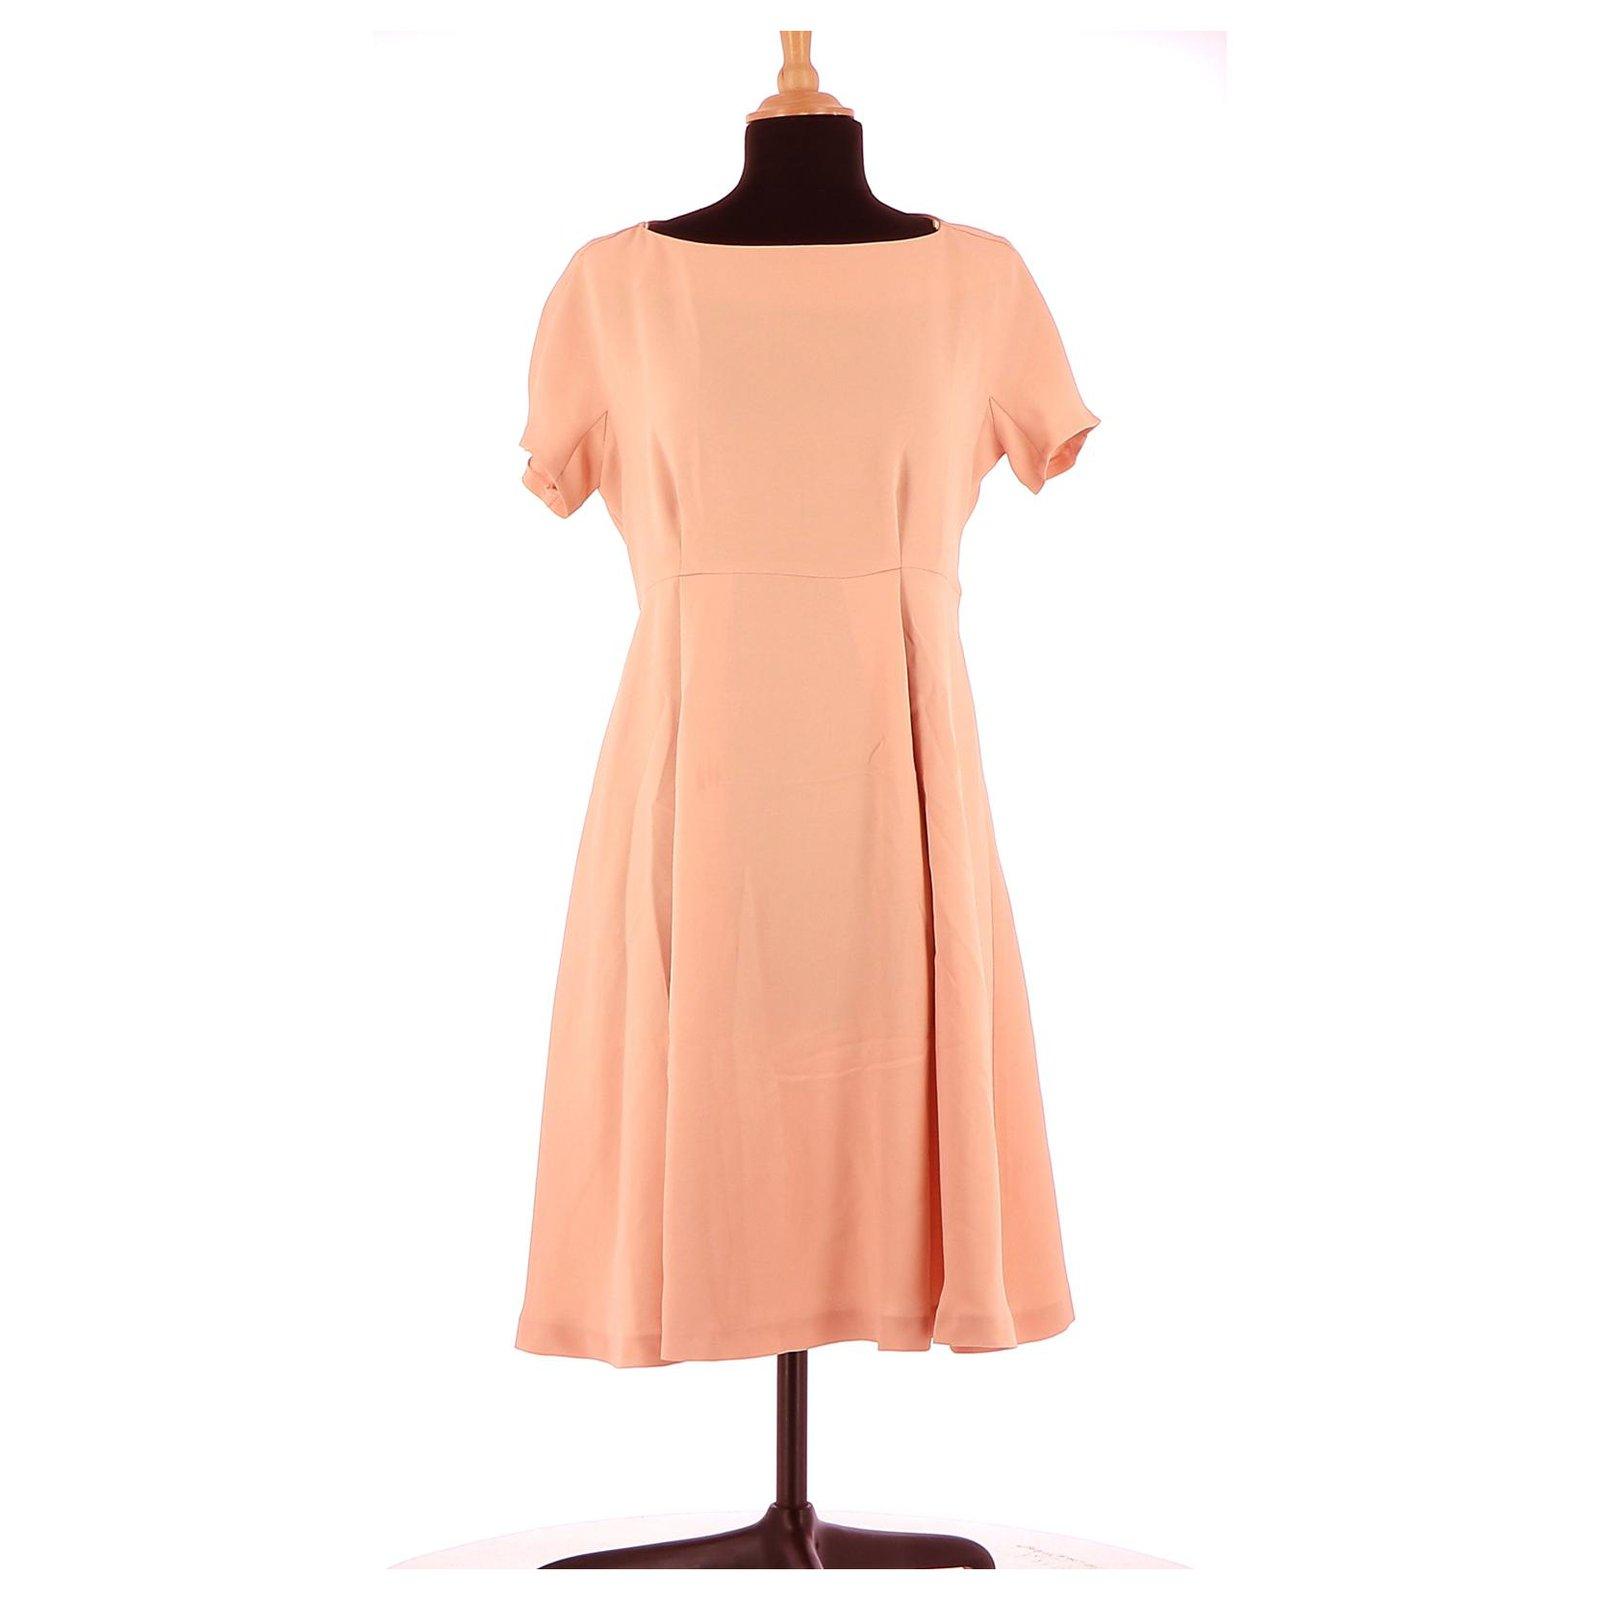 Tara Jarmon Robe Dresses Polyester Pink Ref 150551 Joli Closet